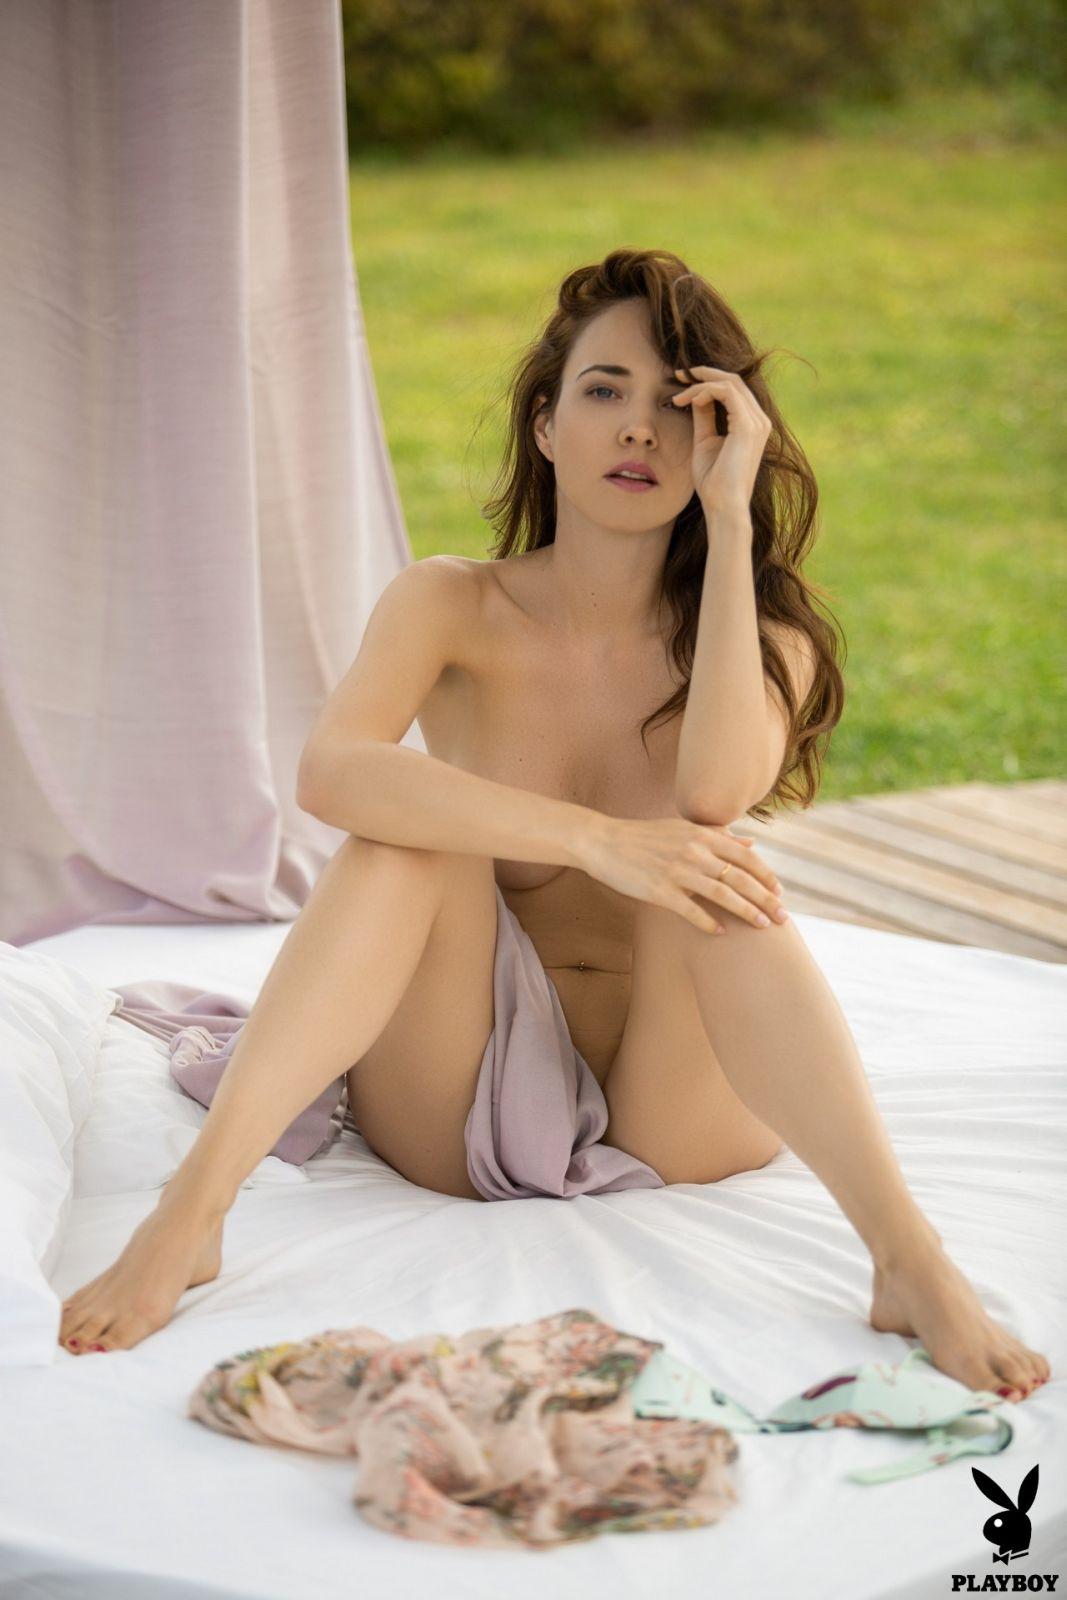 free hot skinny nude pics hellen